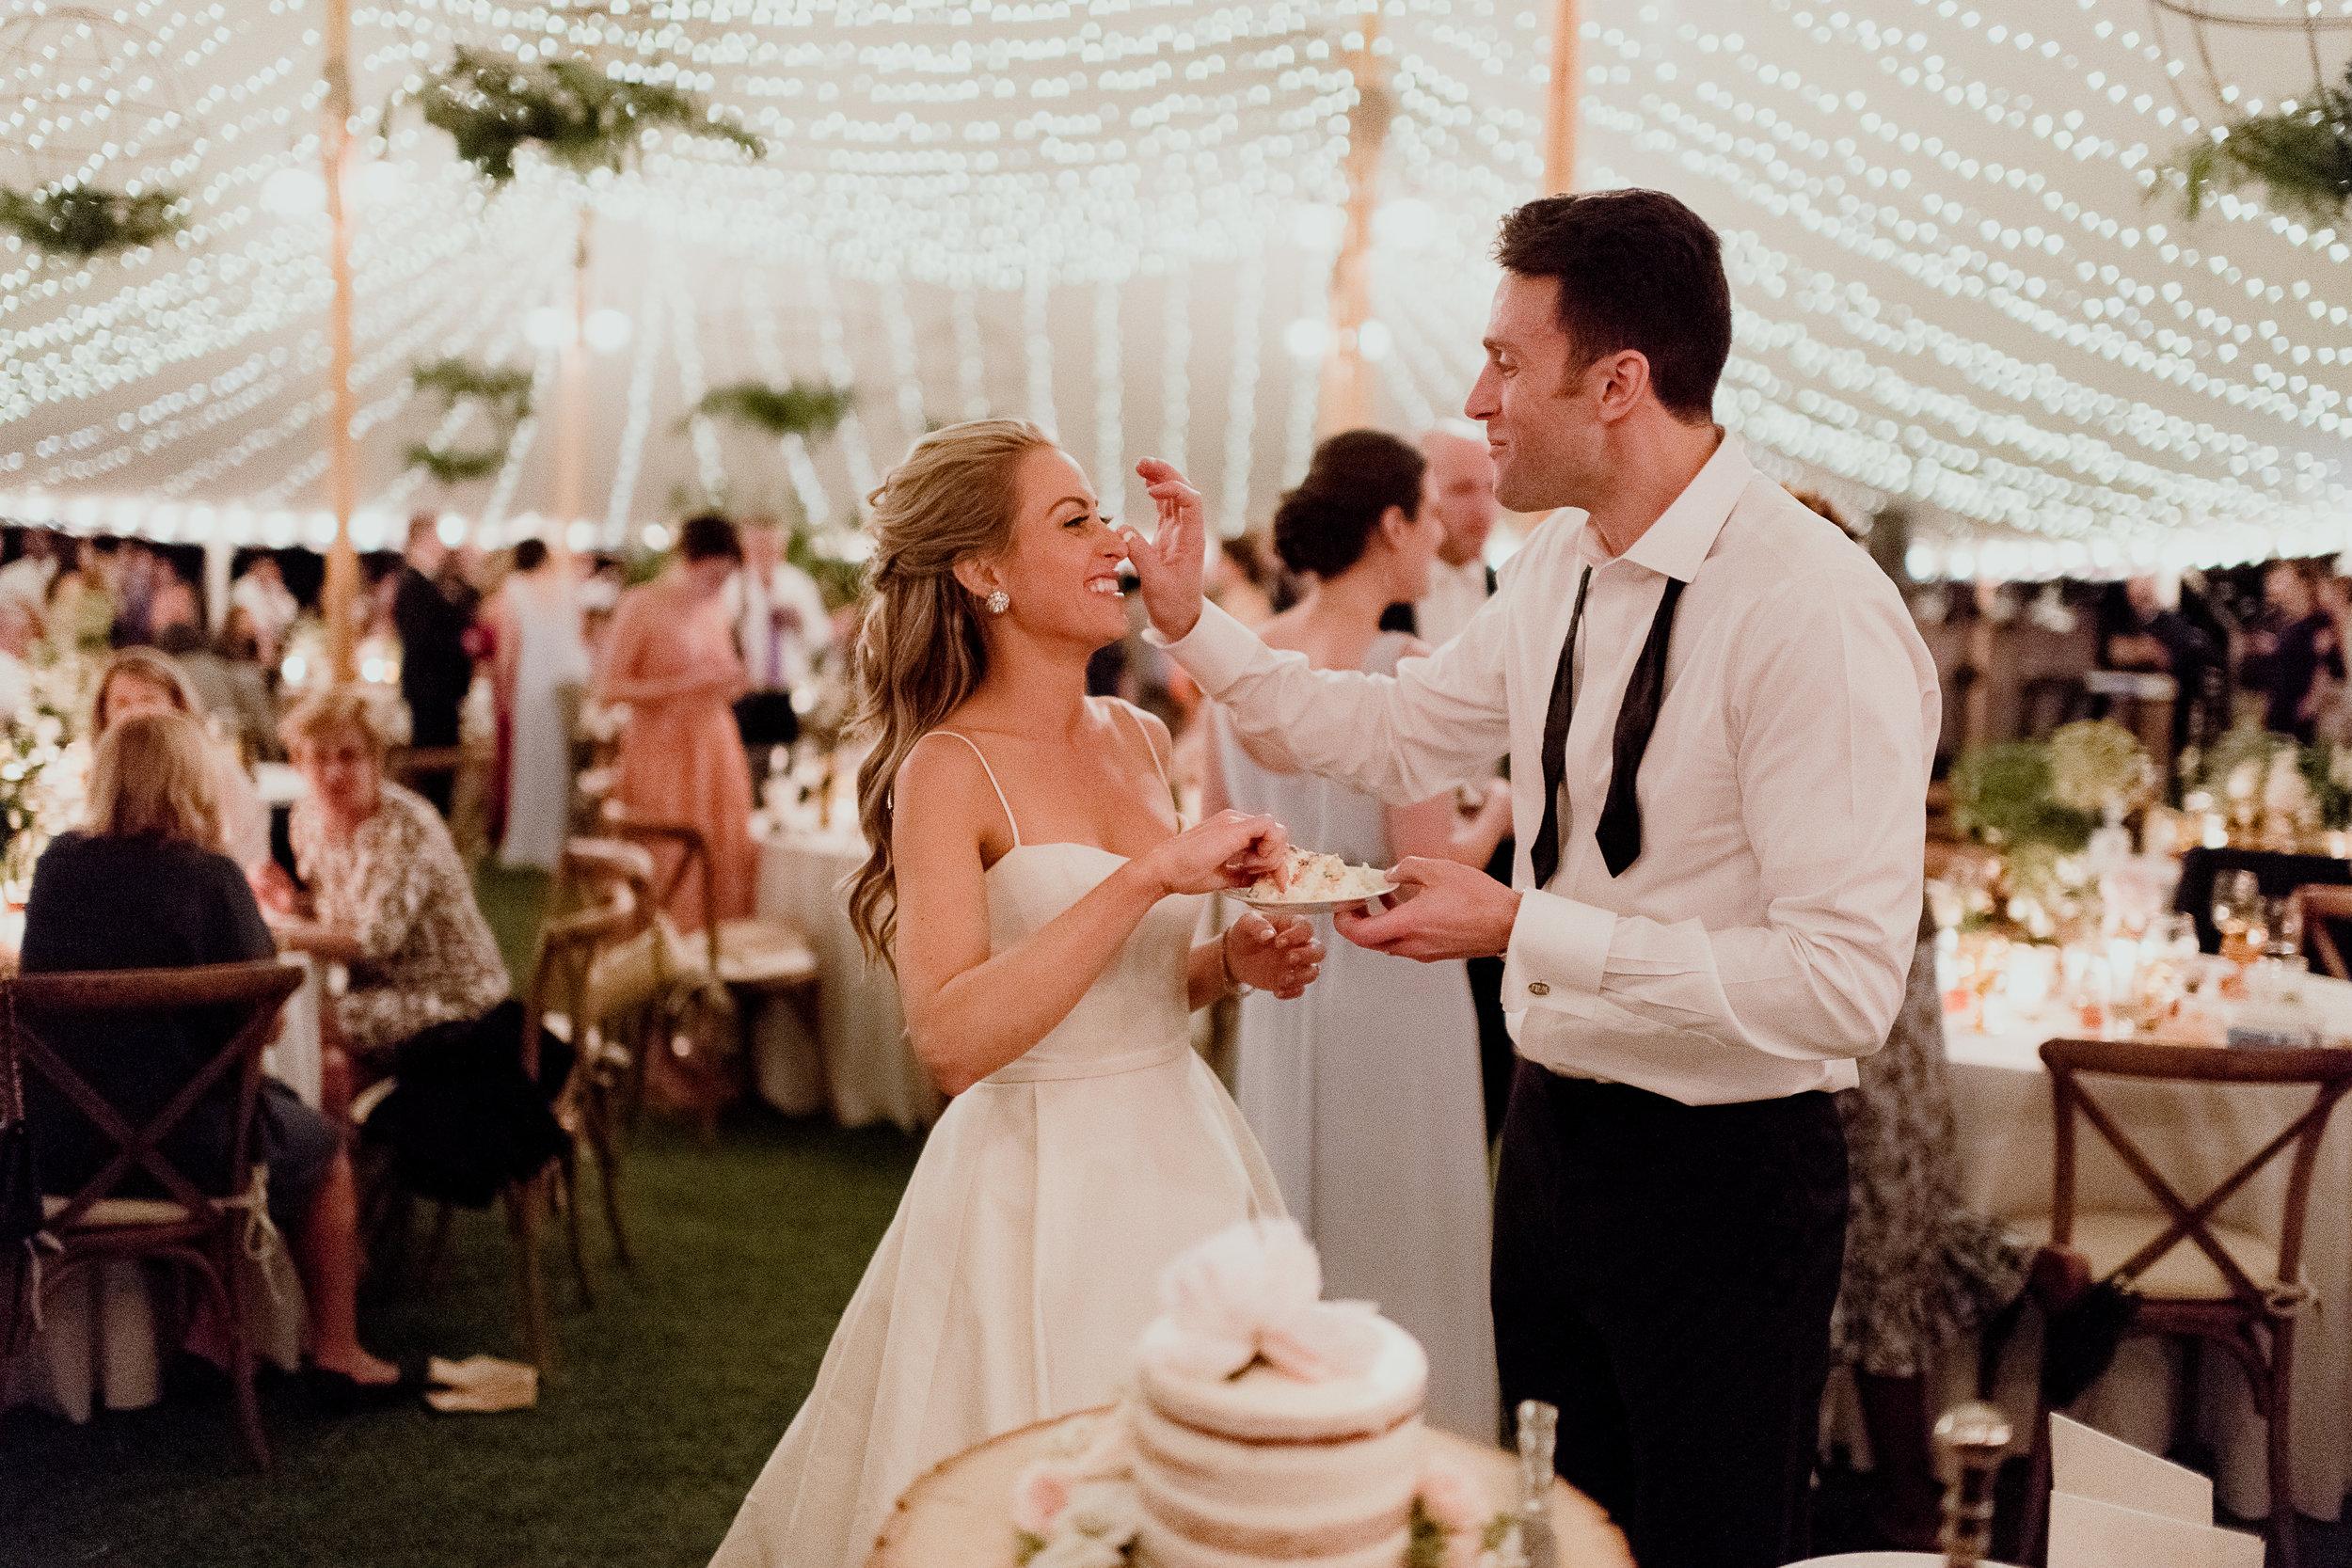 Green & White Wedding Jonathon Edwards Vineyard Wedding0-71.jpg